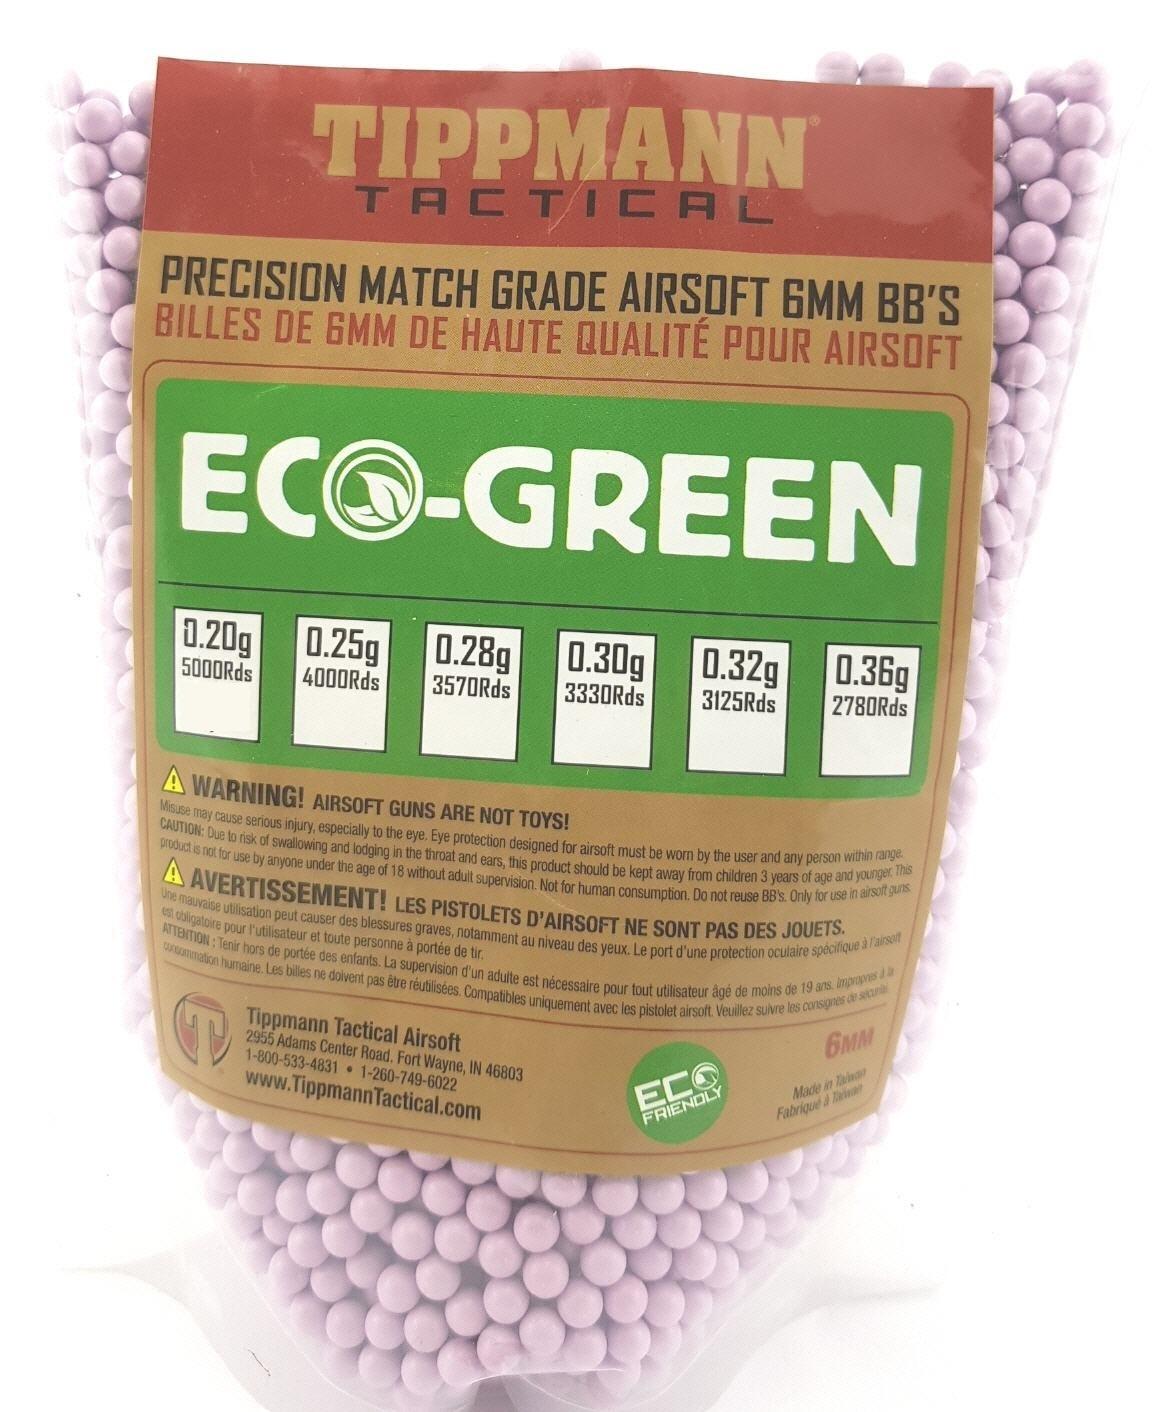 Tippmann Tippmann 0.30g - 3330 bio bb's - purple